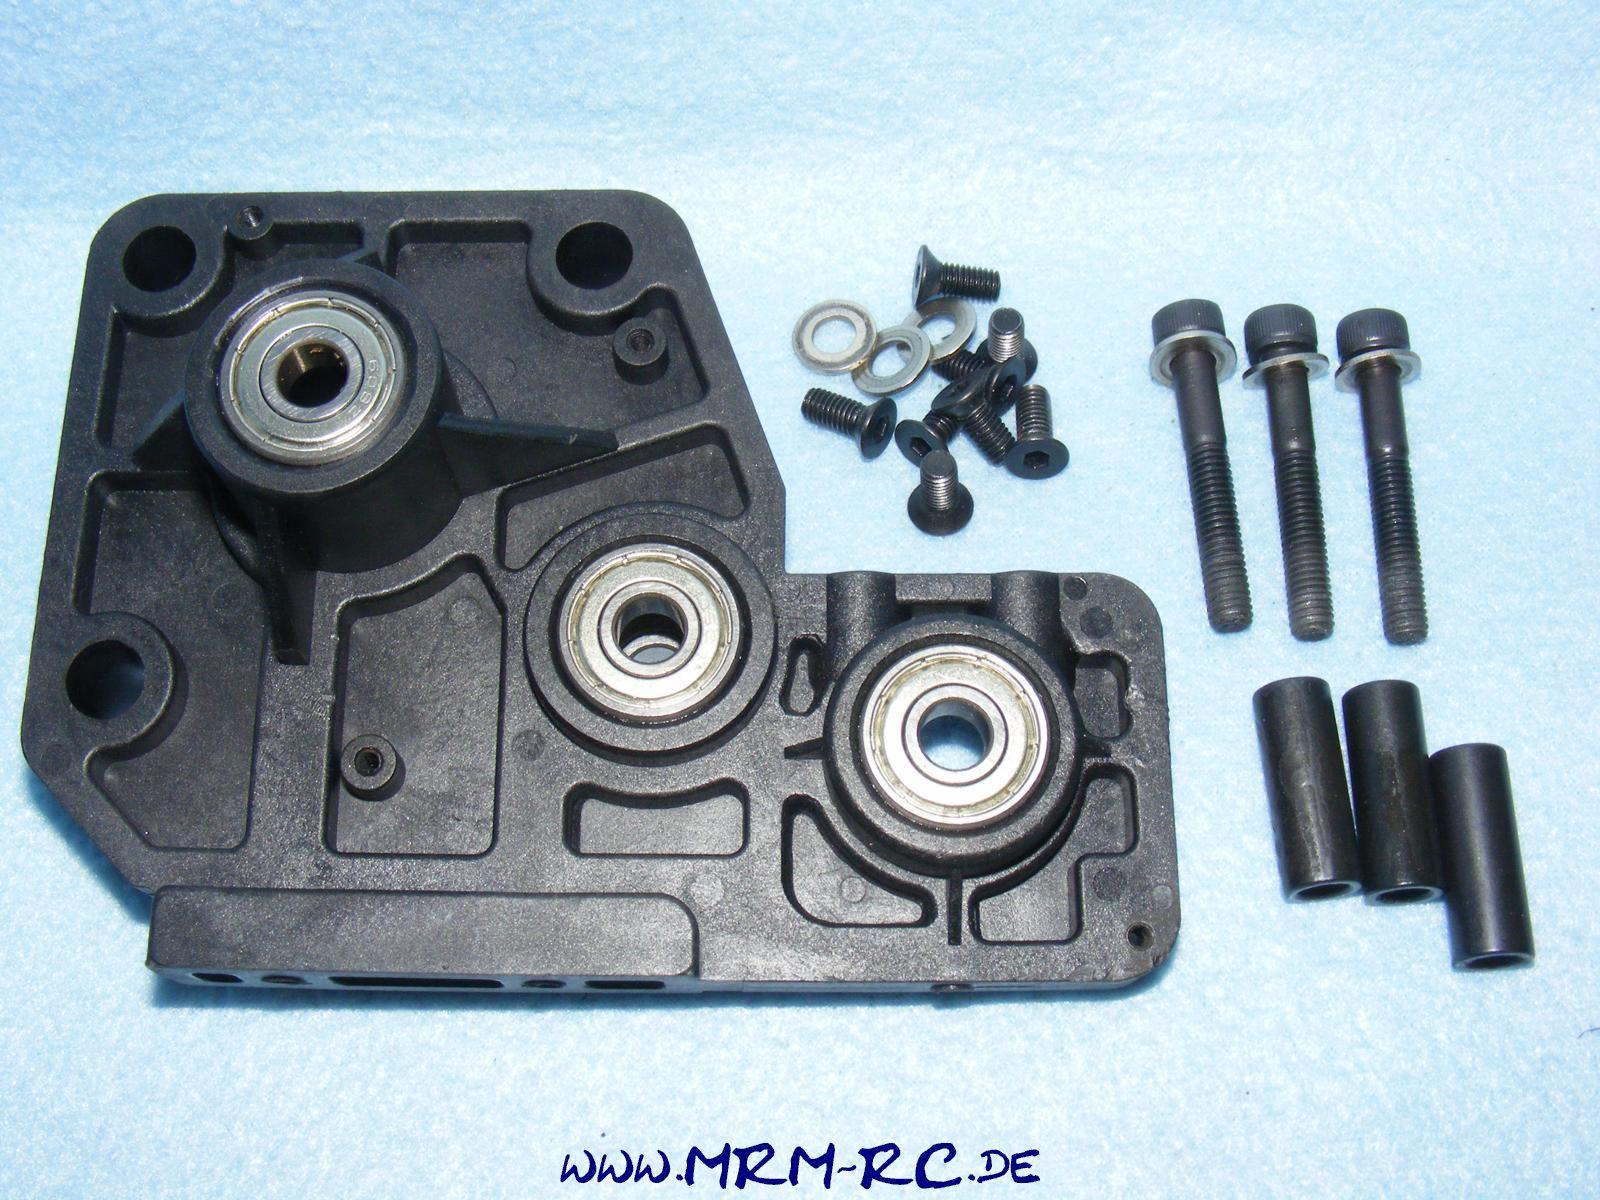 Carson Dirt Attack 500305241 gear plate Getriebeplatte